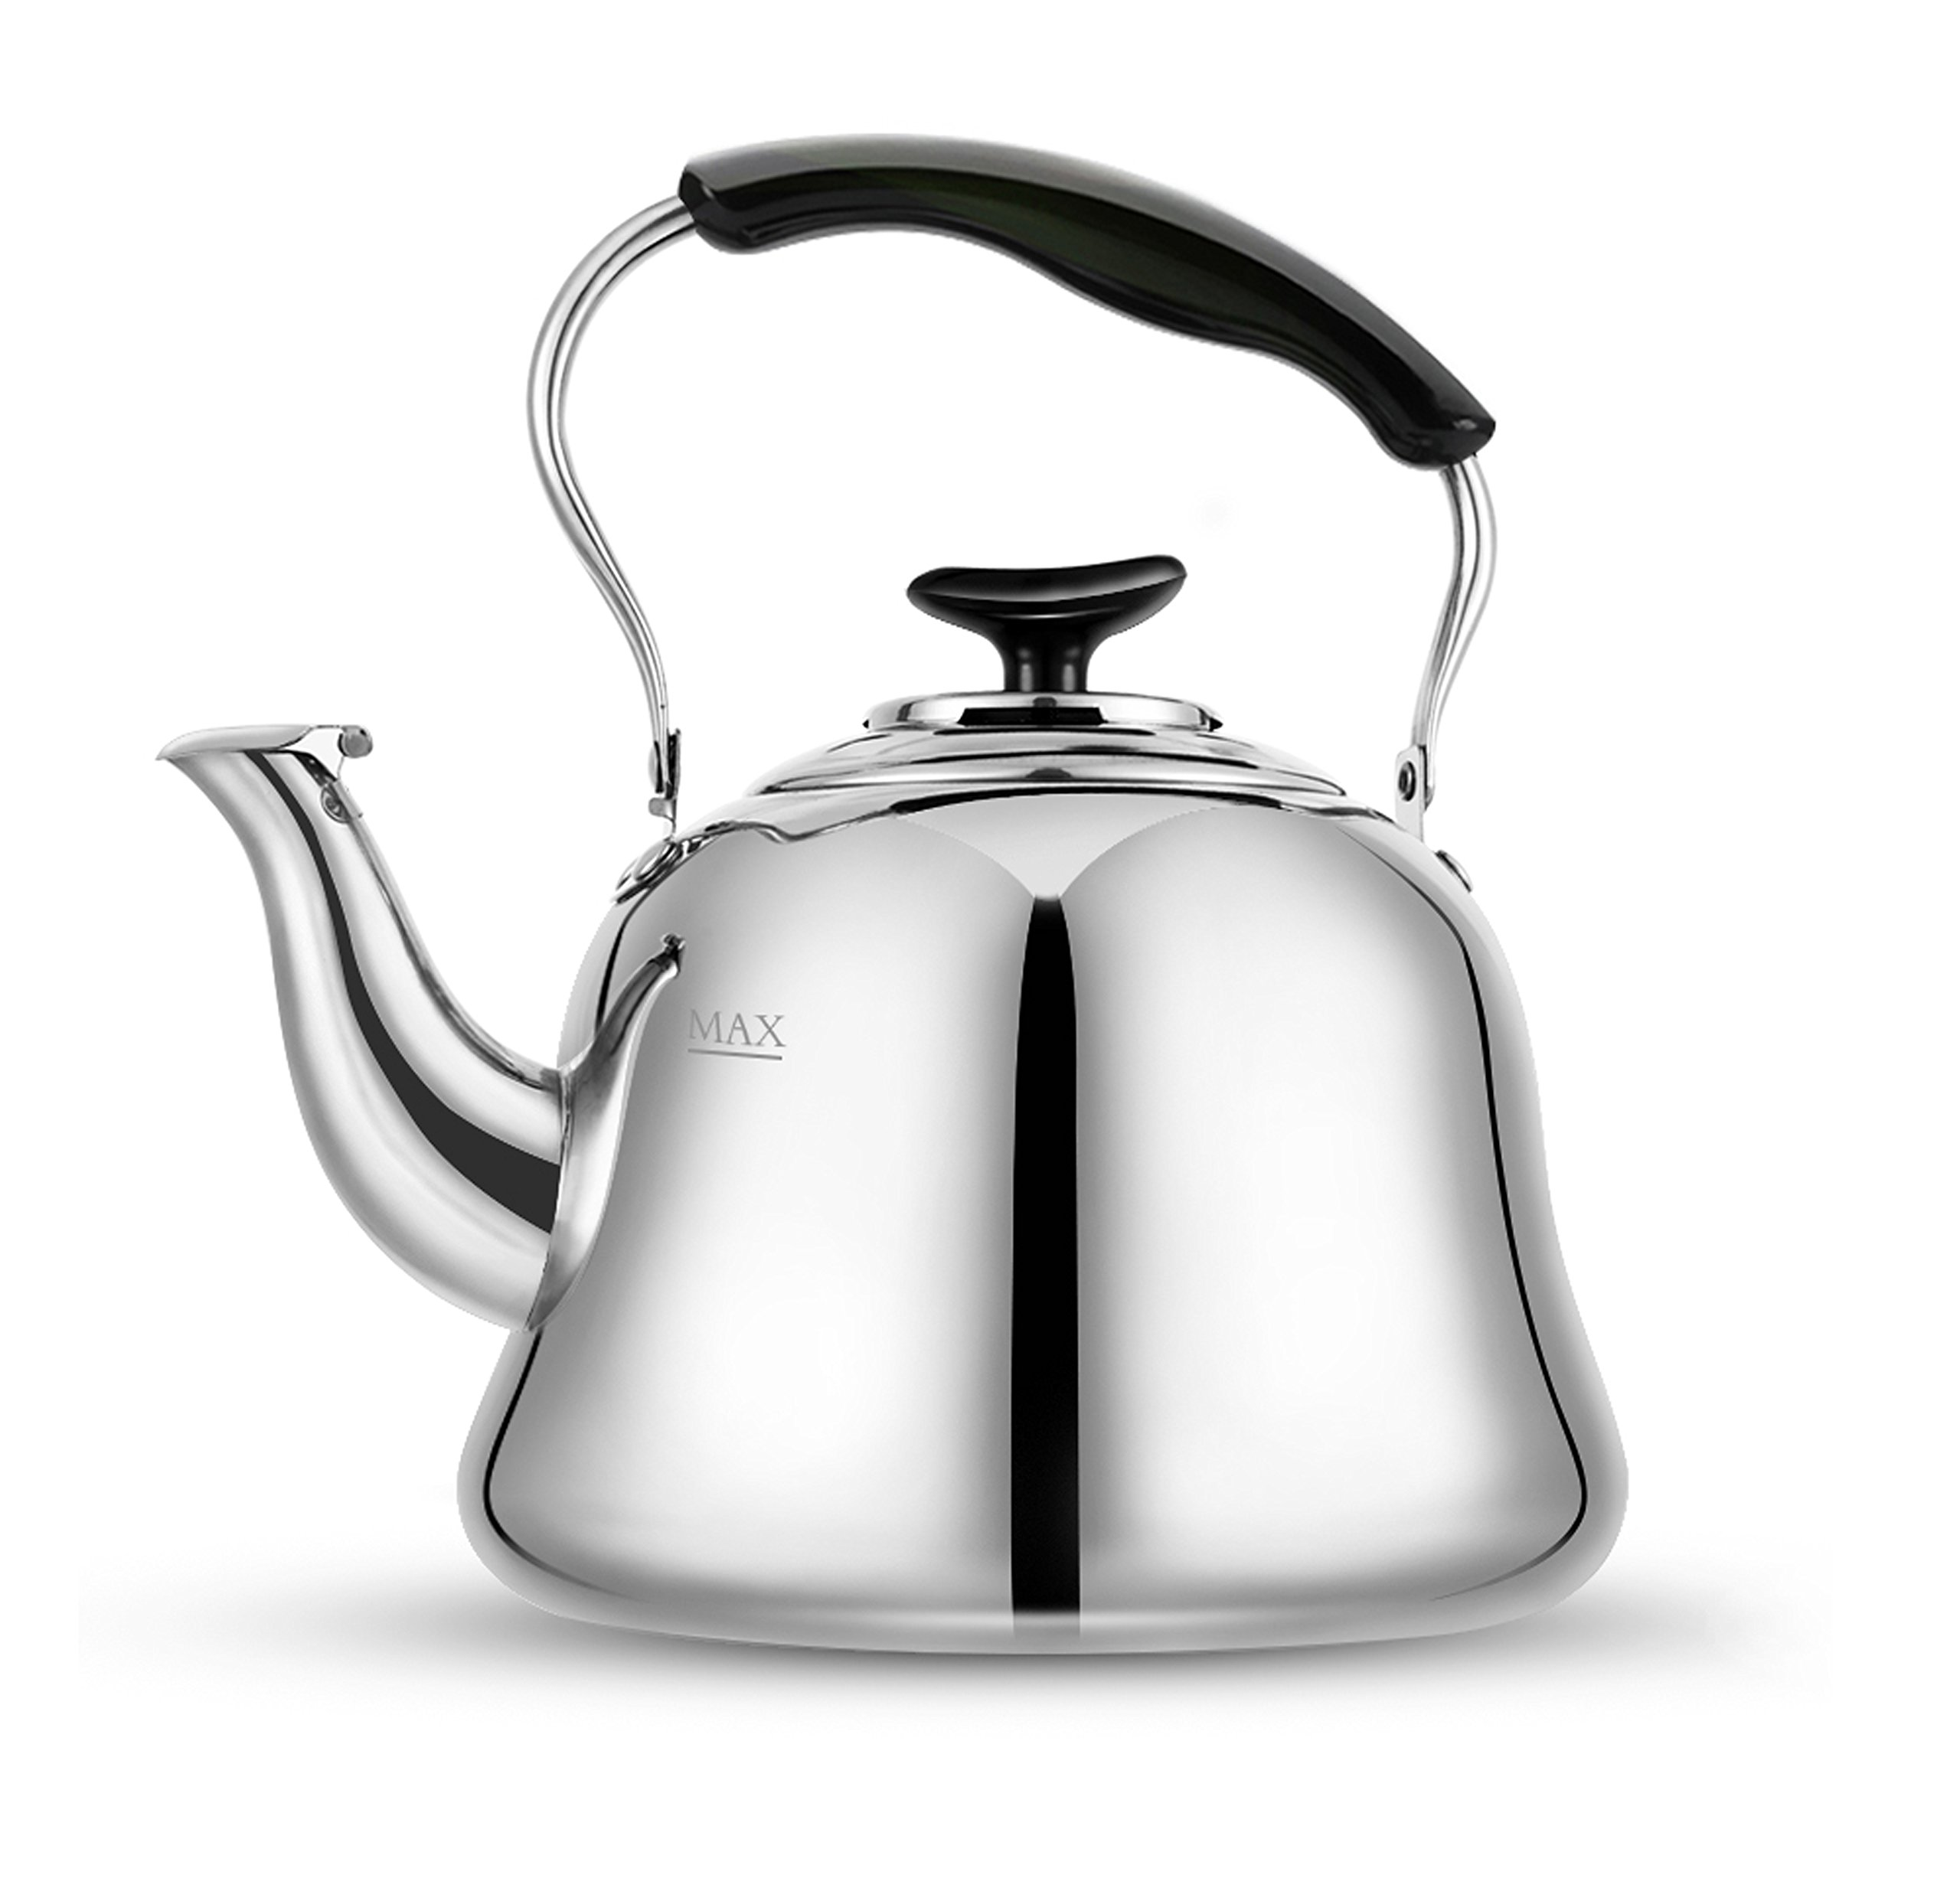 Tea Kettle Stovetop Whistling Teakettle Teapot, Stainless Steel, Thin Base, Mirror Finish, 2 liters by AMFOCUS